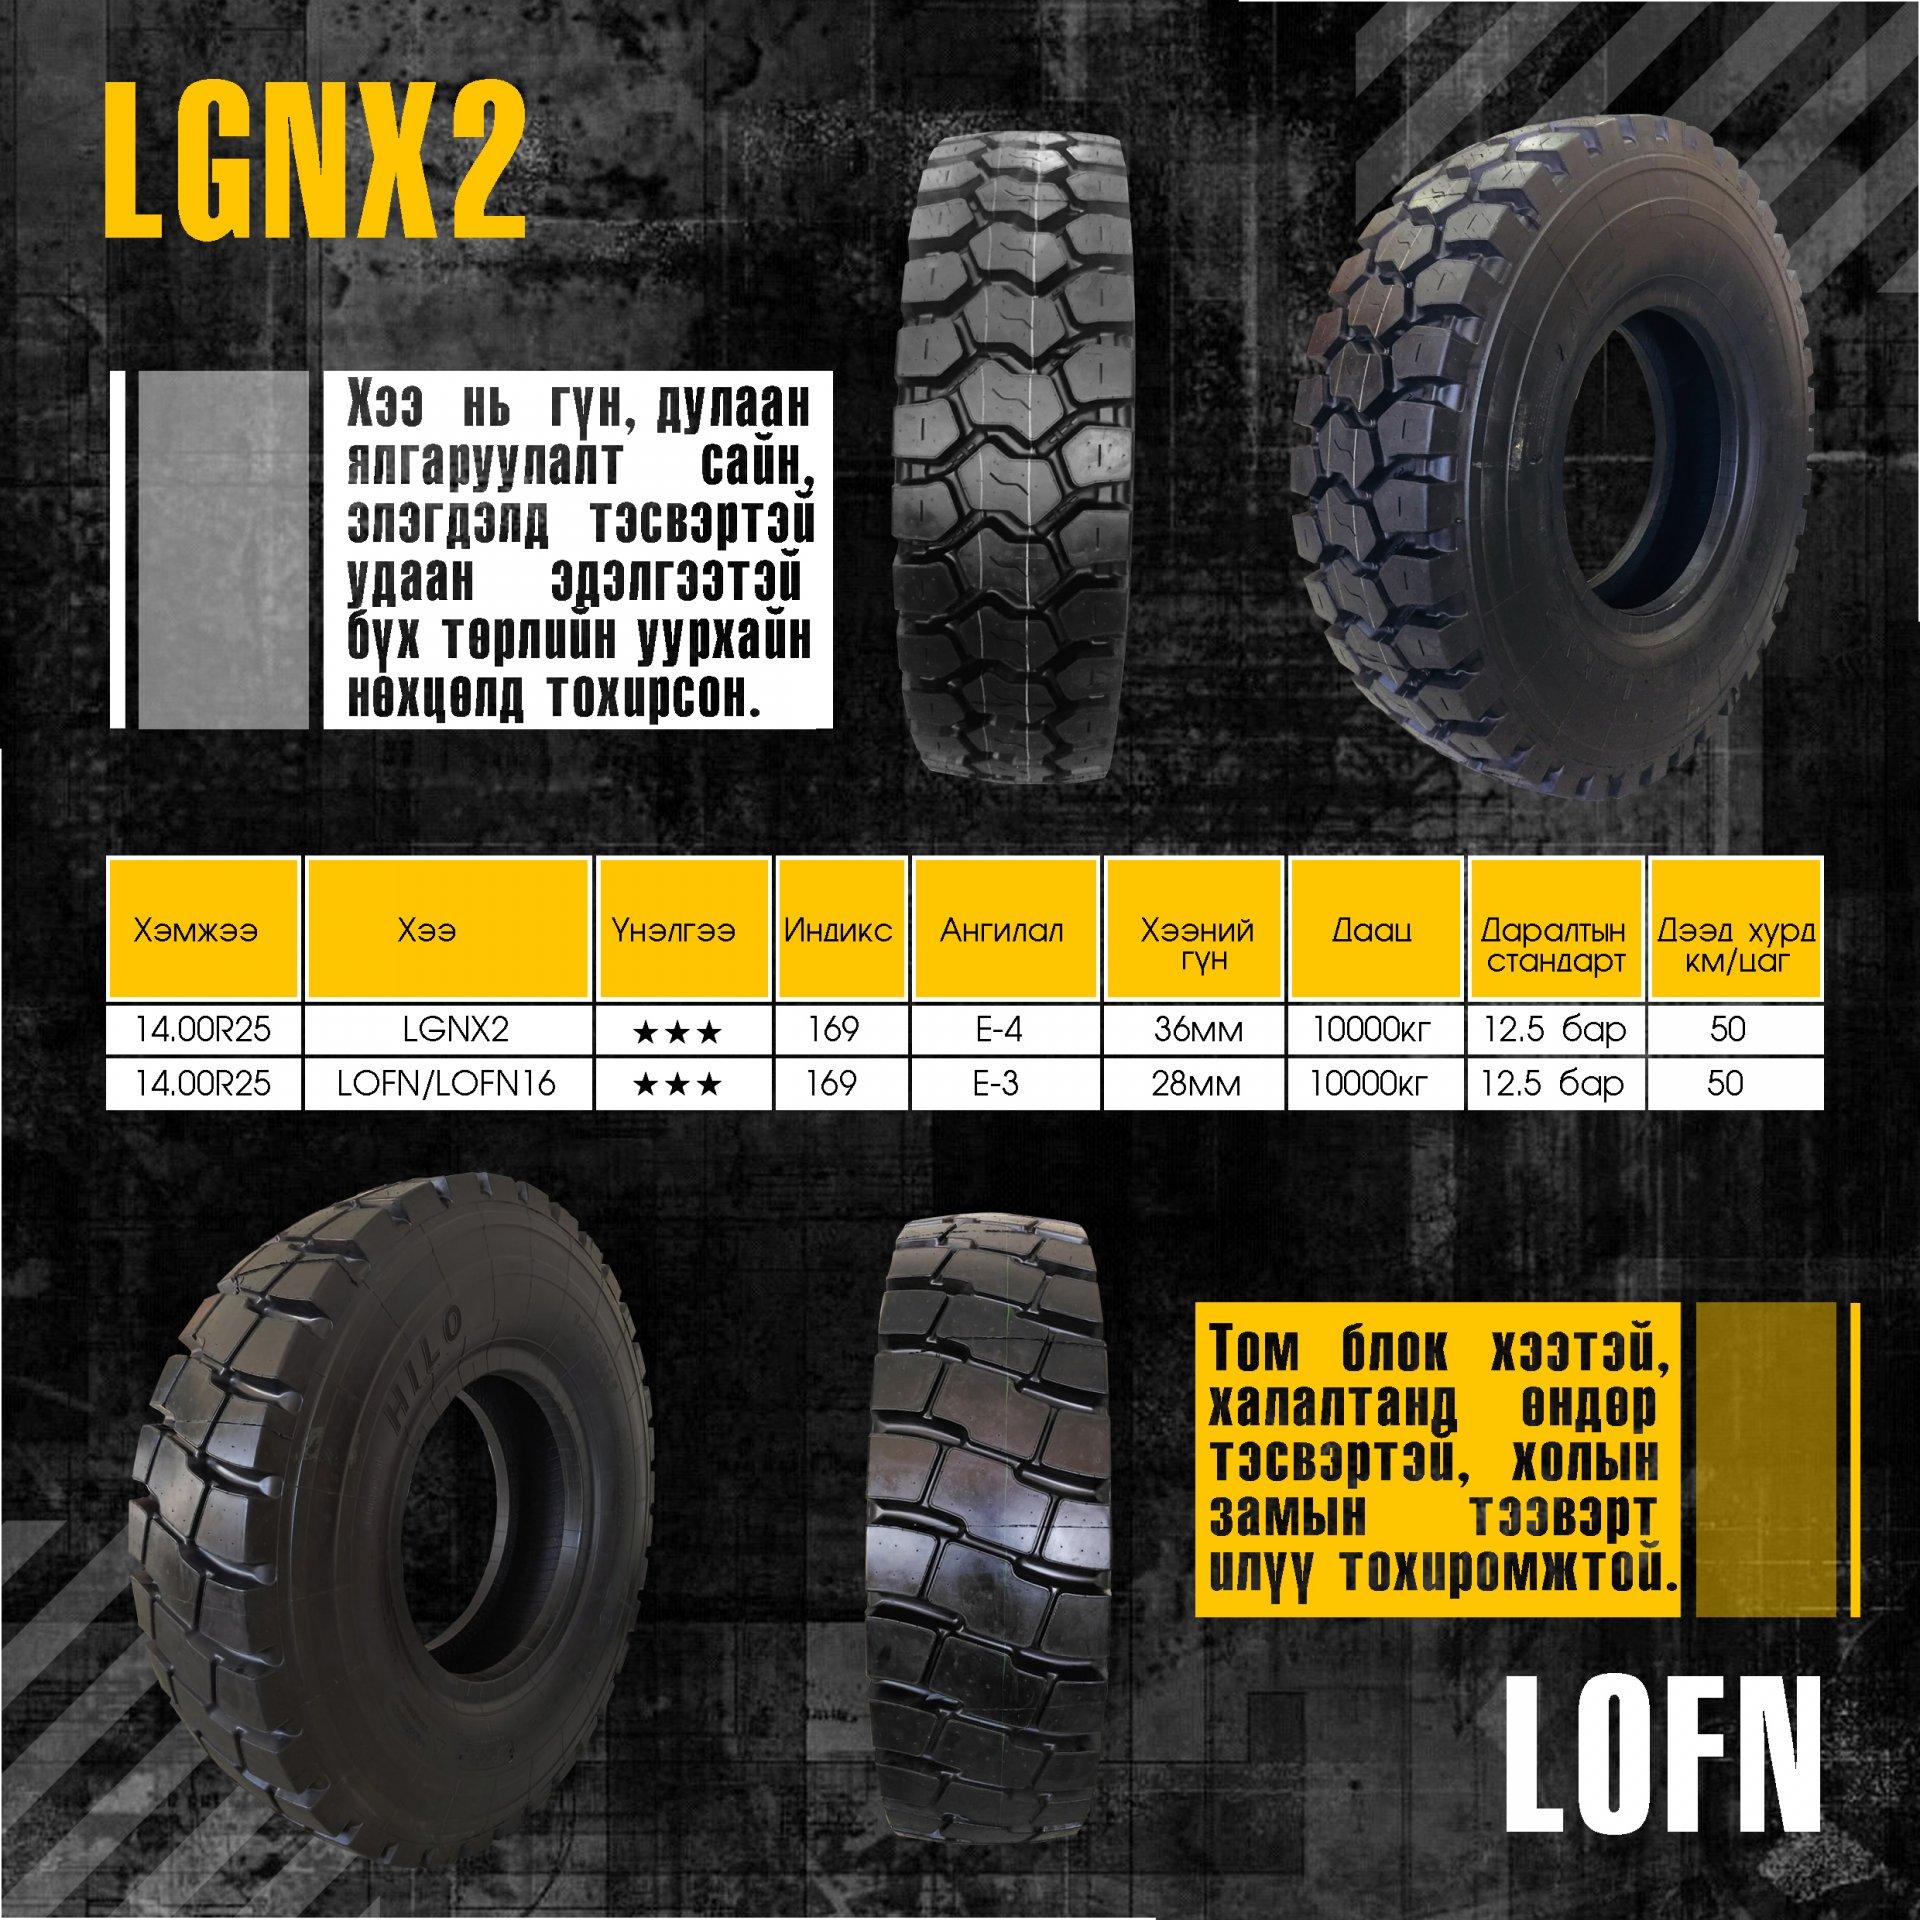 HILO  ---- LGNX   LOFN